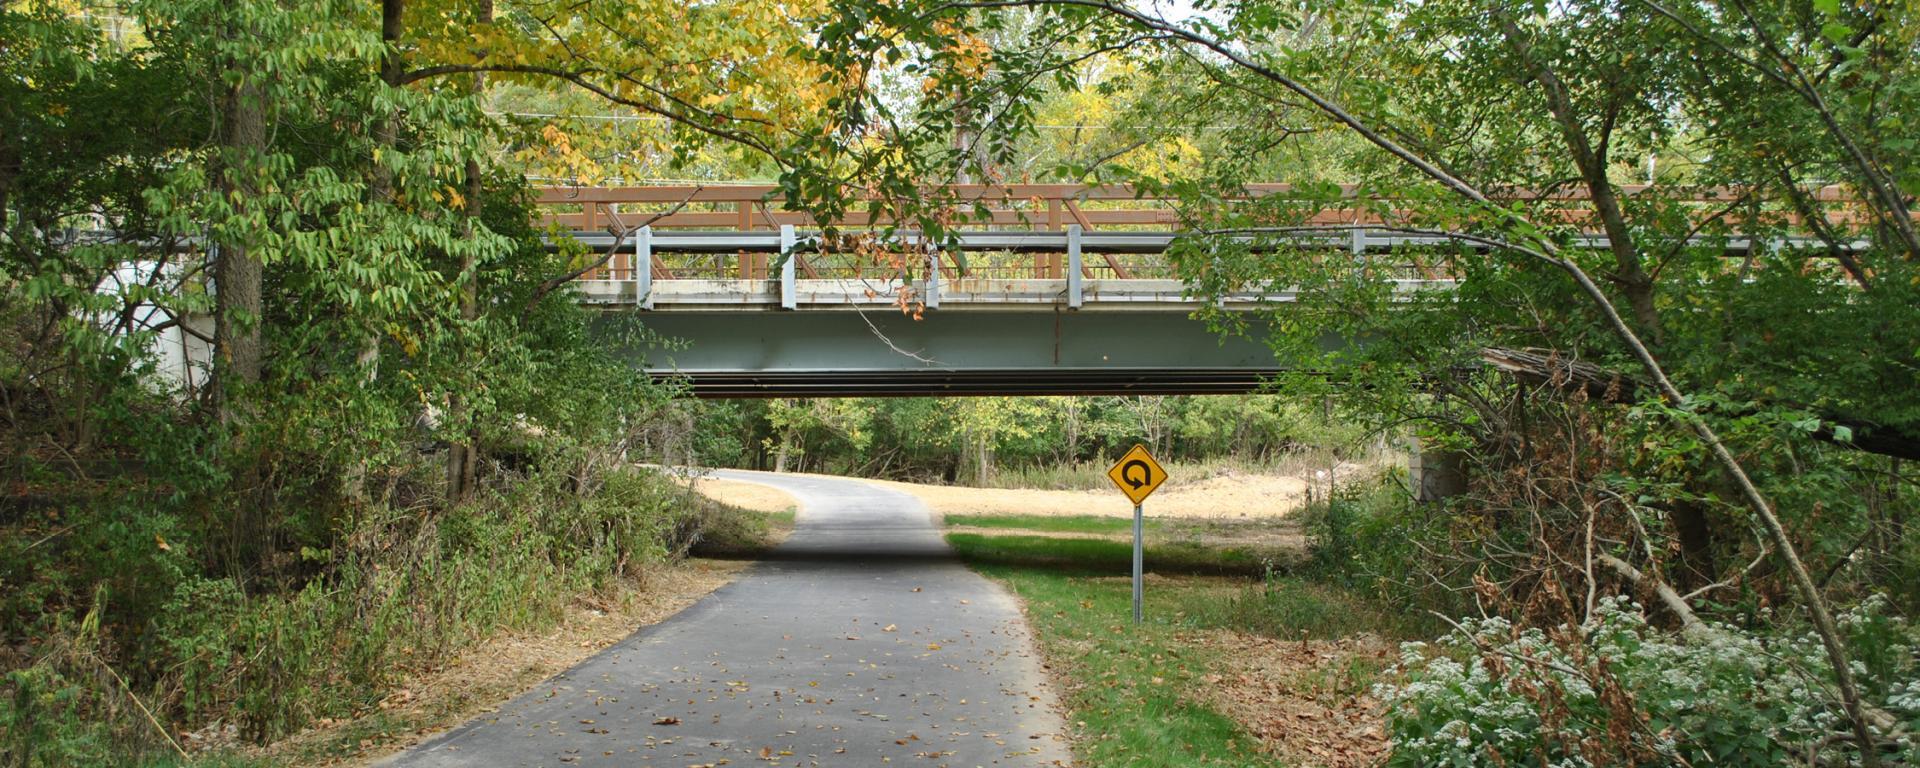 bridge over paved trail